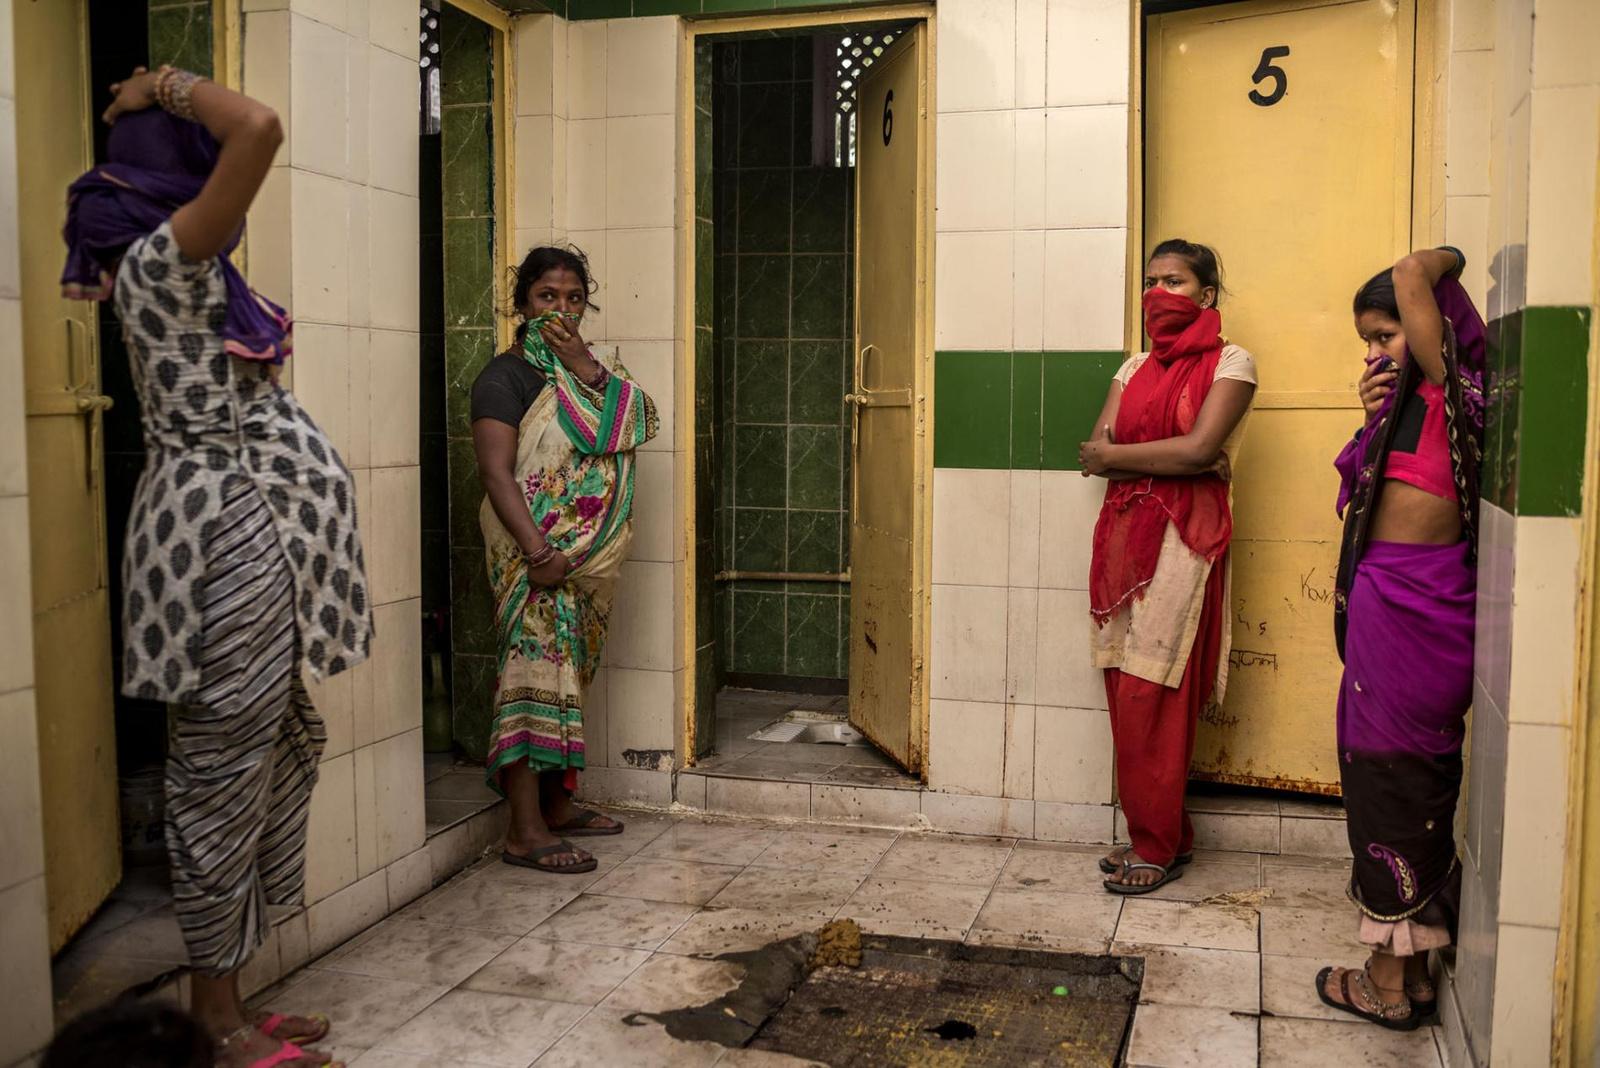 sanitation-india-women.adapt.1900.1